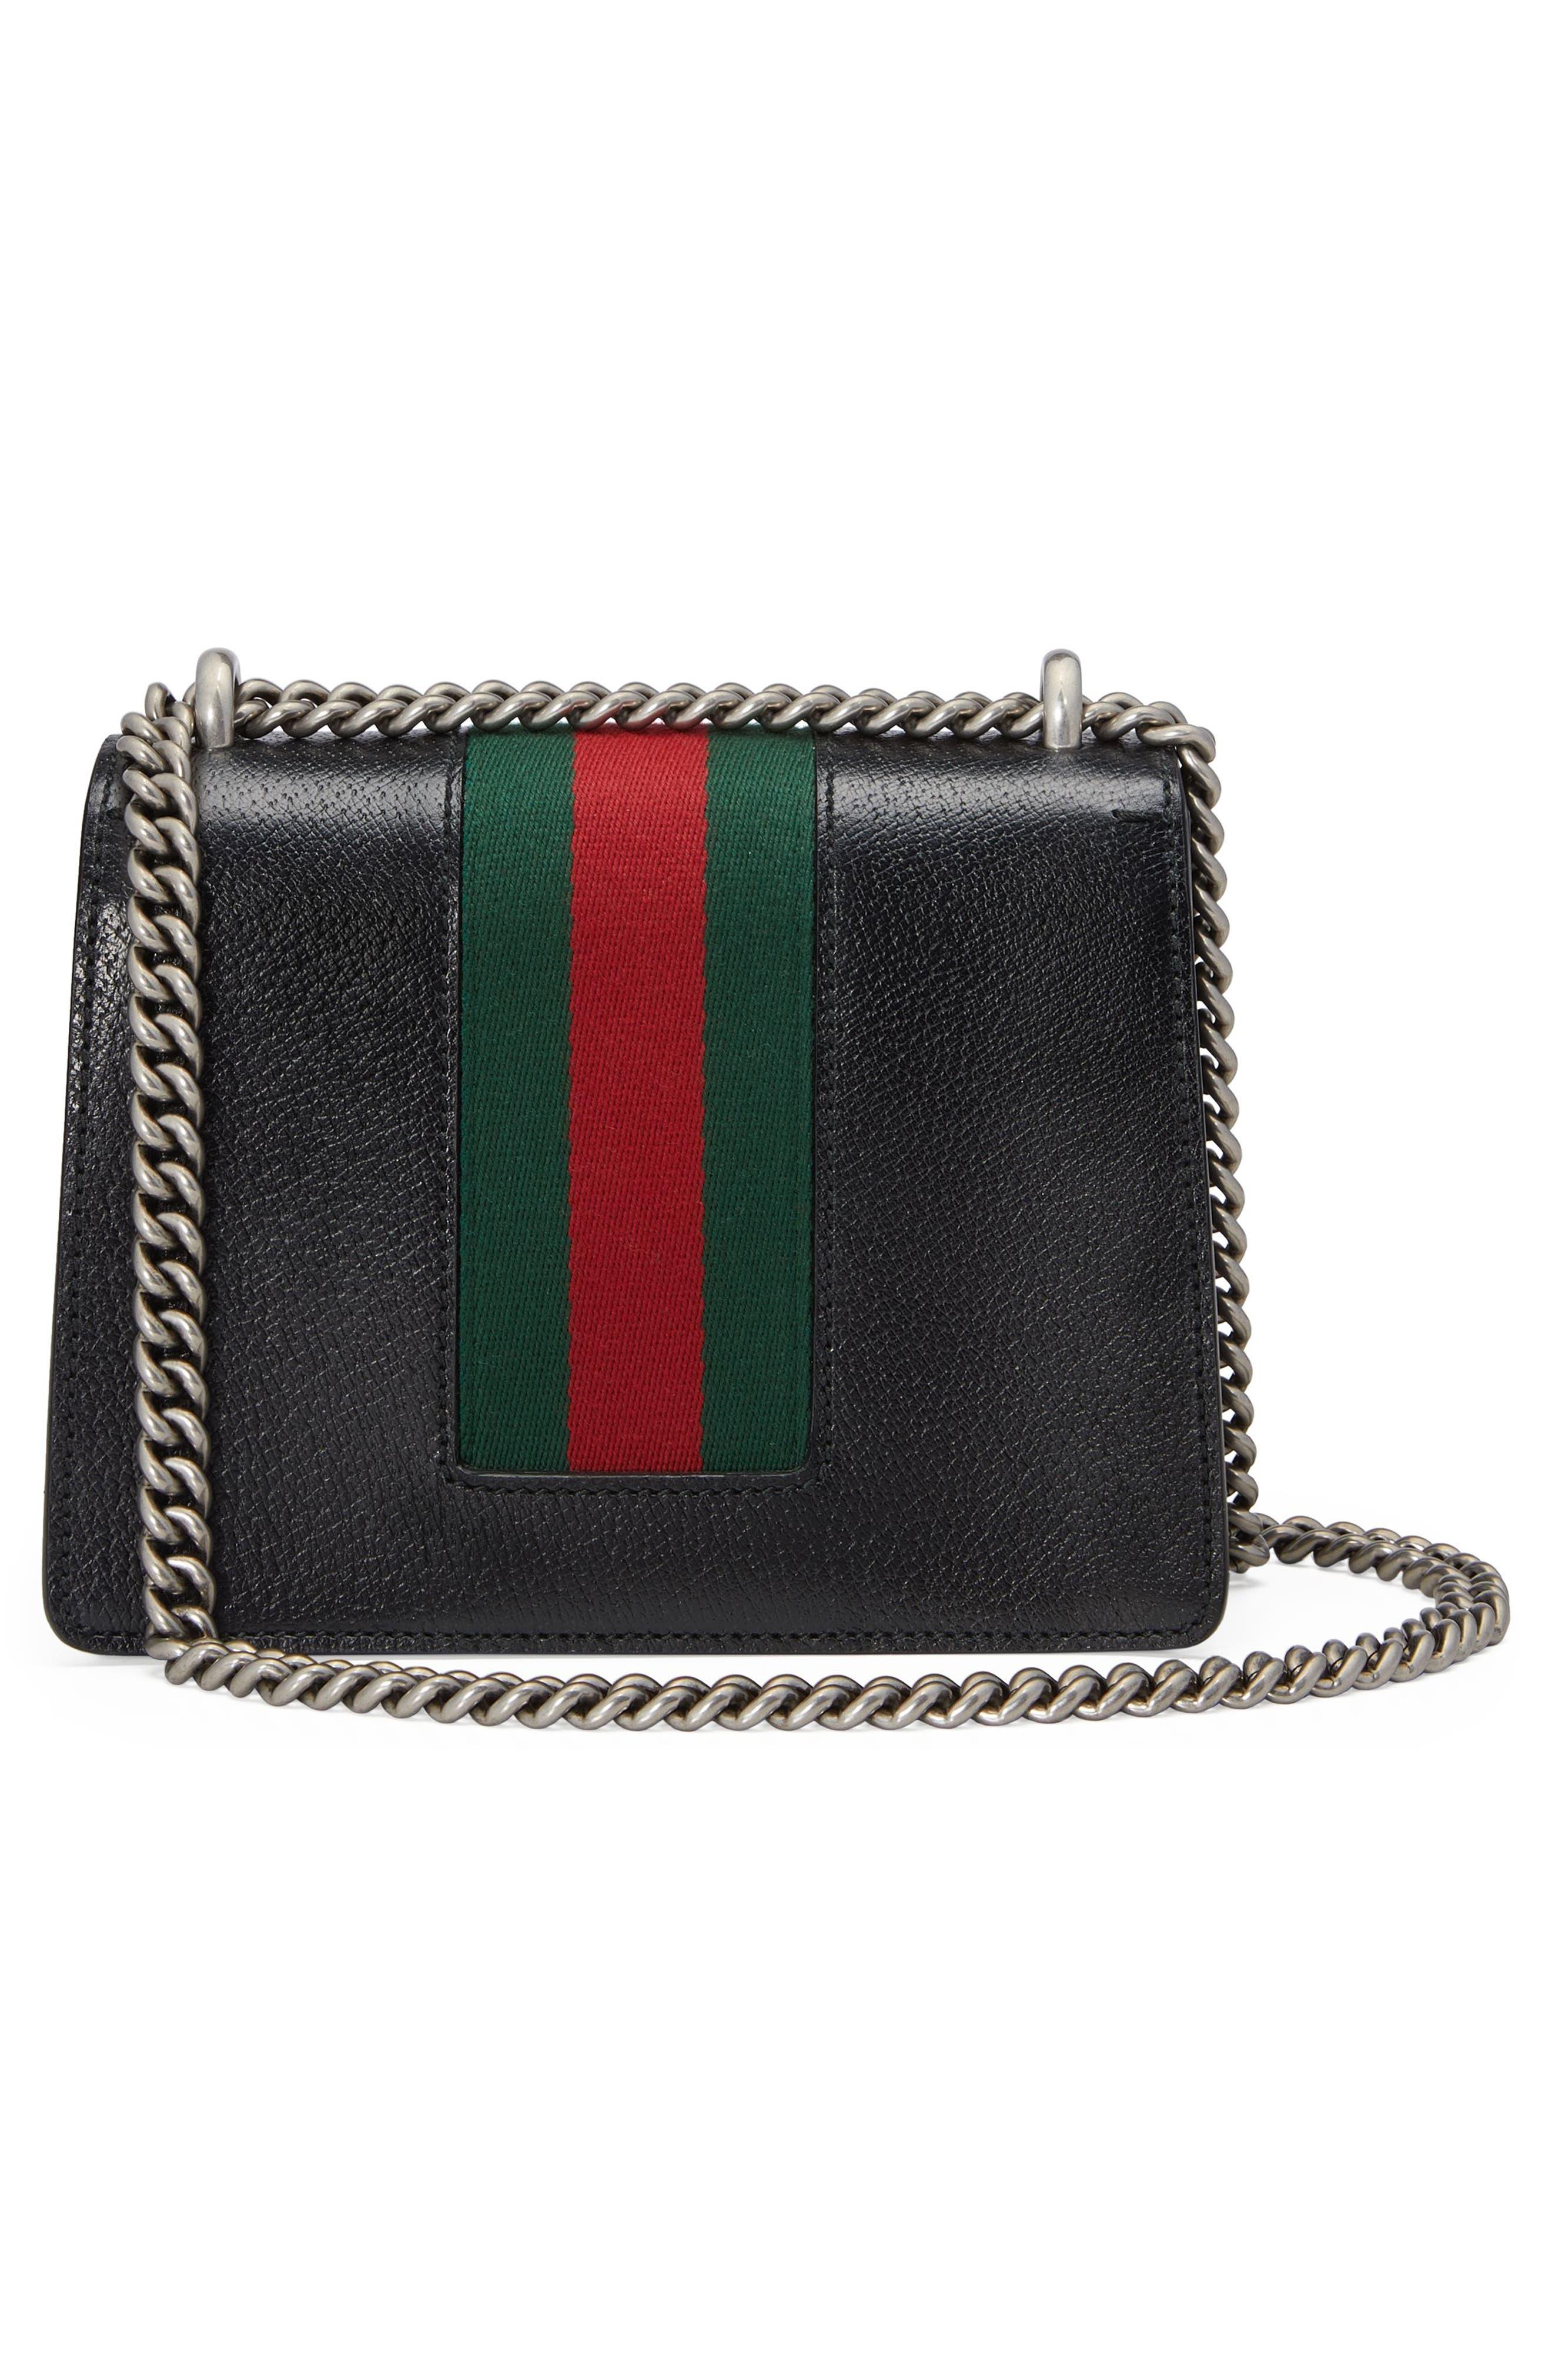 Small Dionysus House Web Leather Shoulder Bag,                             Alternate thumbnail 2, color,                             001